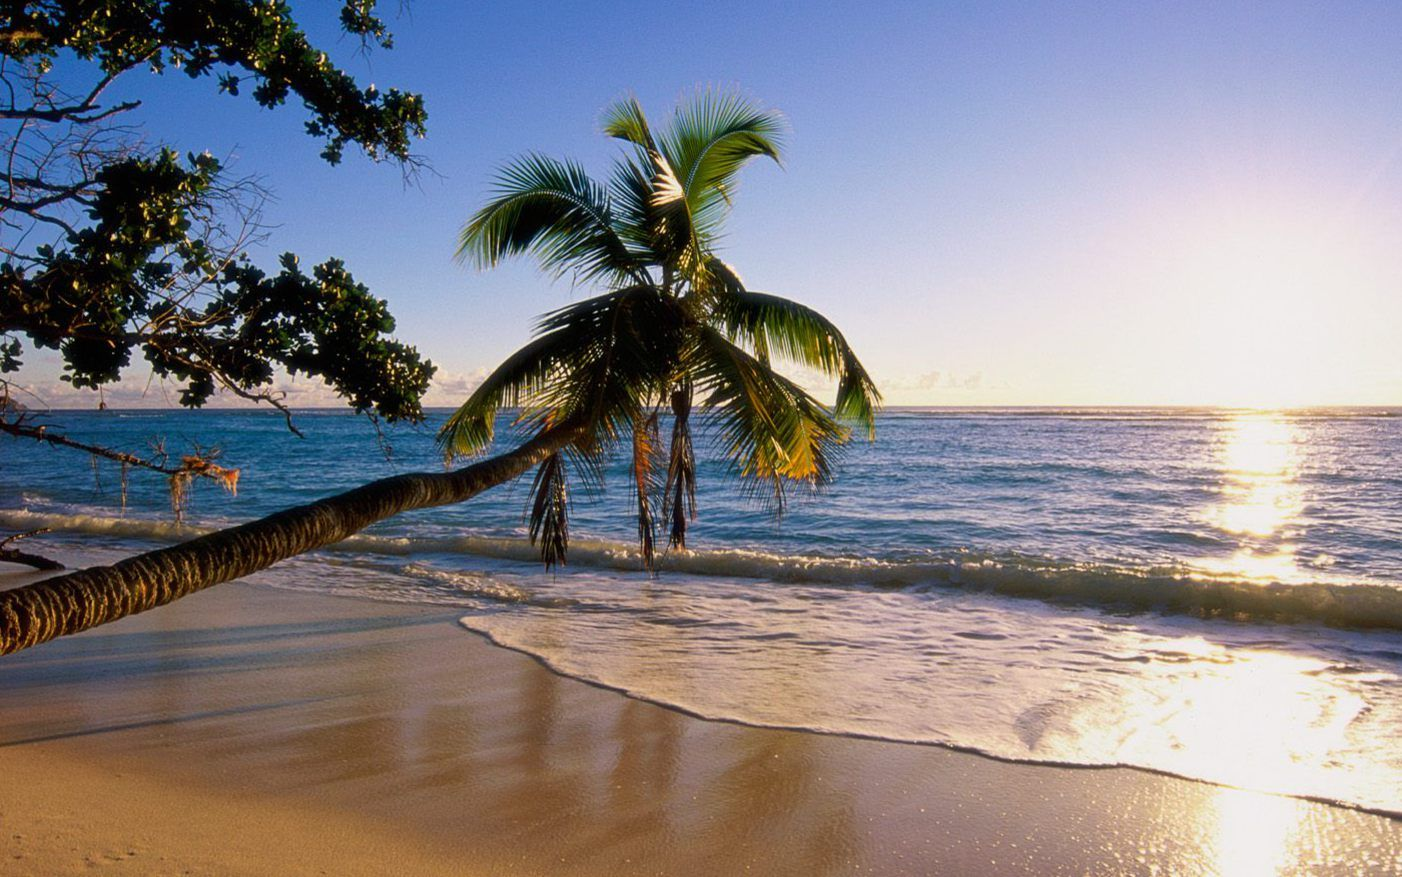 sunsets tropical beaches | Tropical Island, beaches, island, sunset, tropical